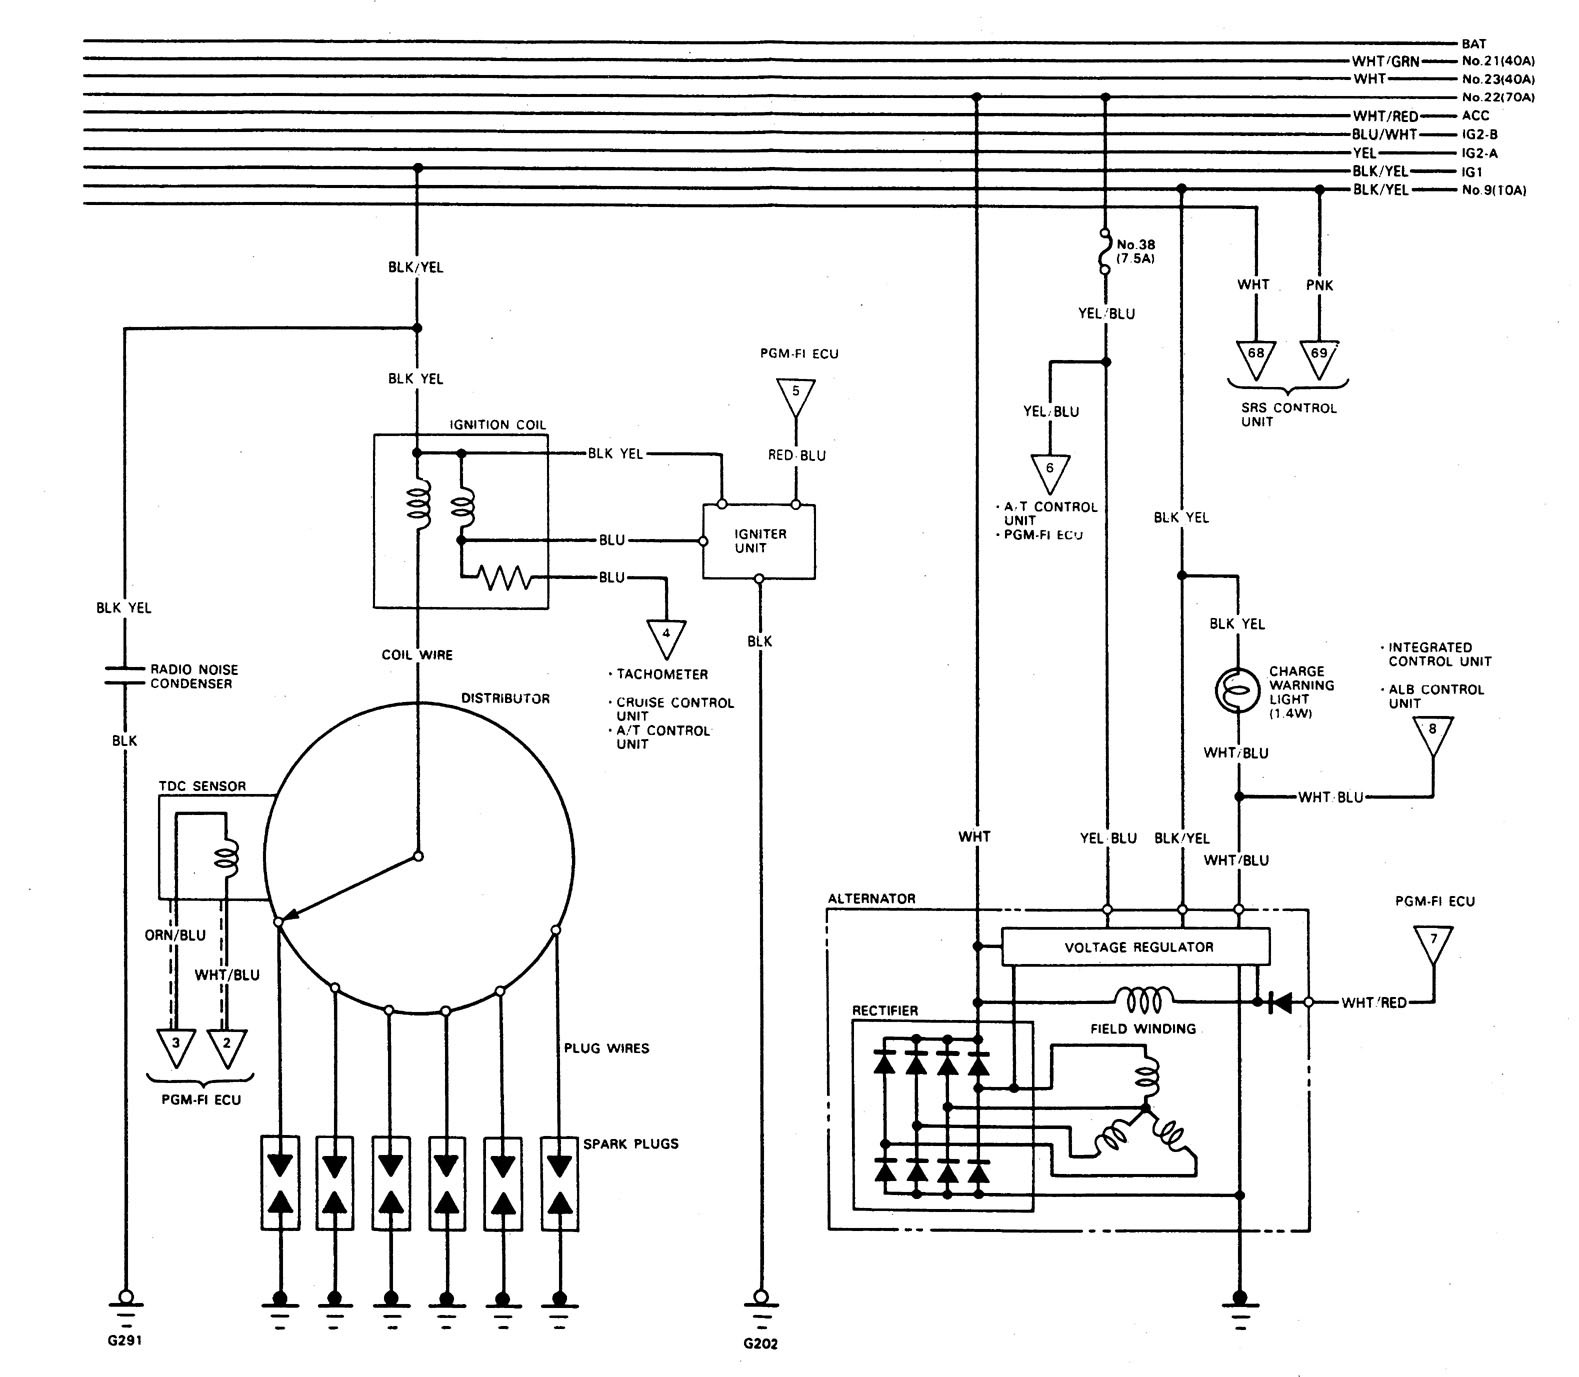 2004 dodge durango wiring harness diagram